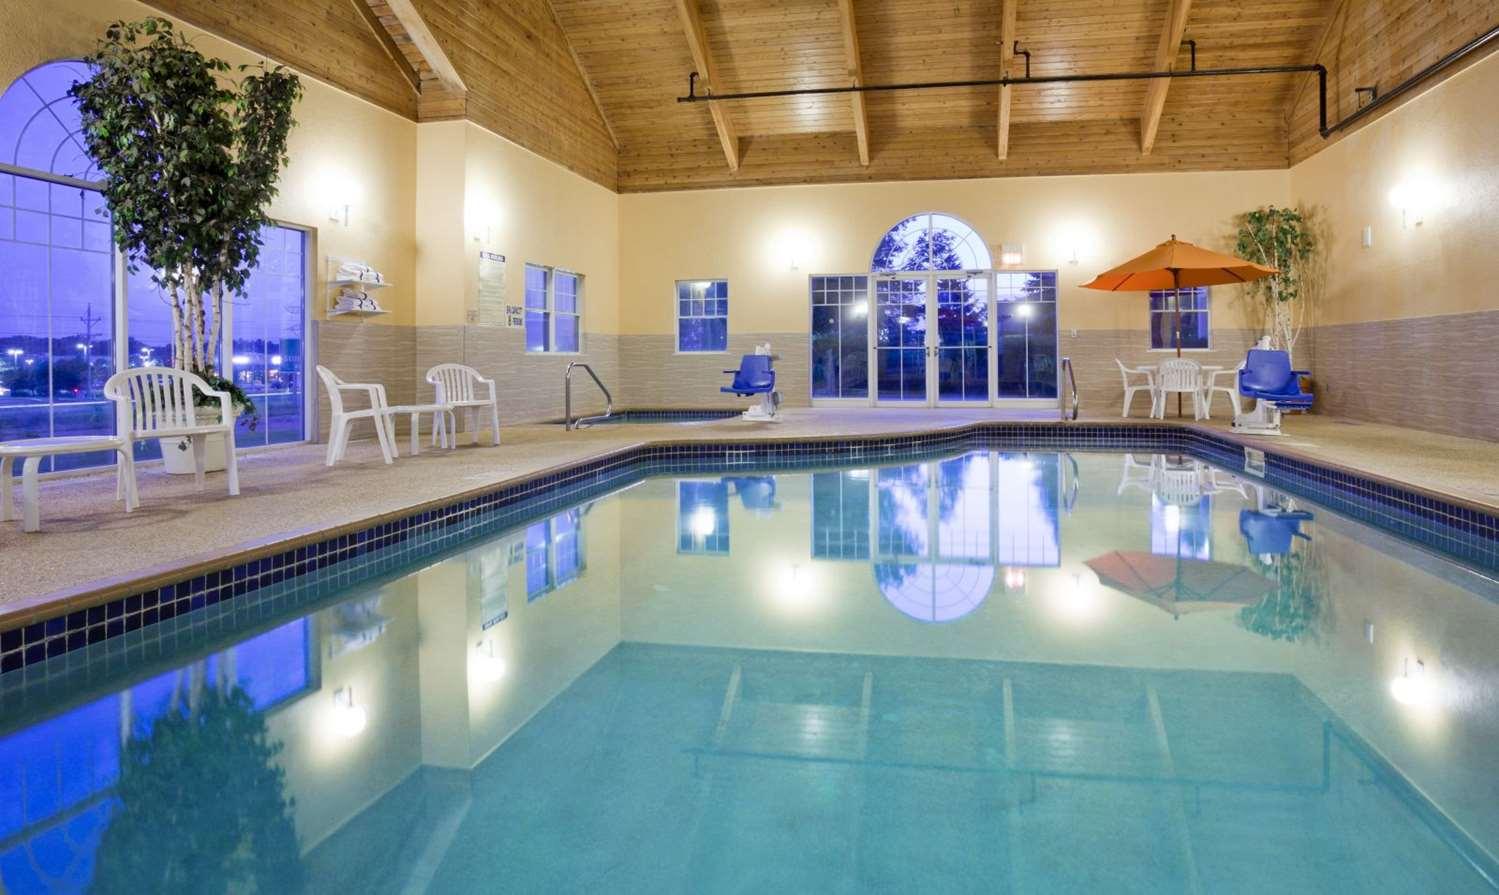 Pool - GrandStay Hotel & Suites Stillwater